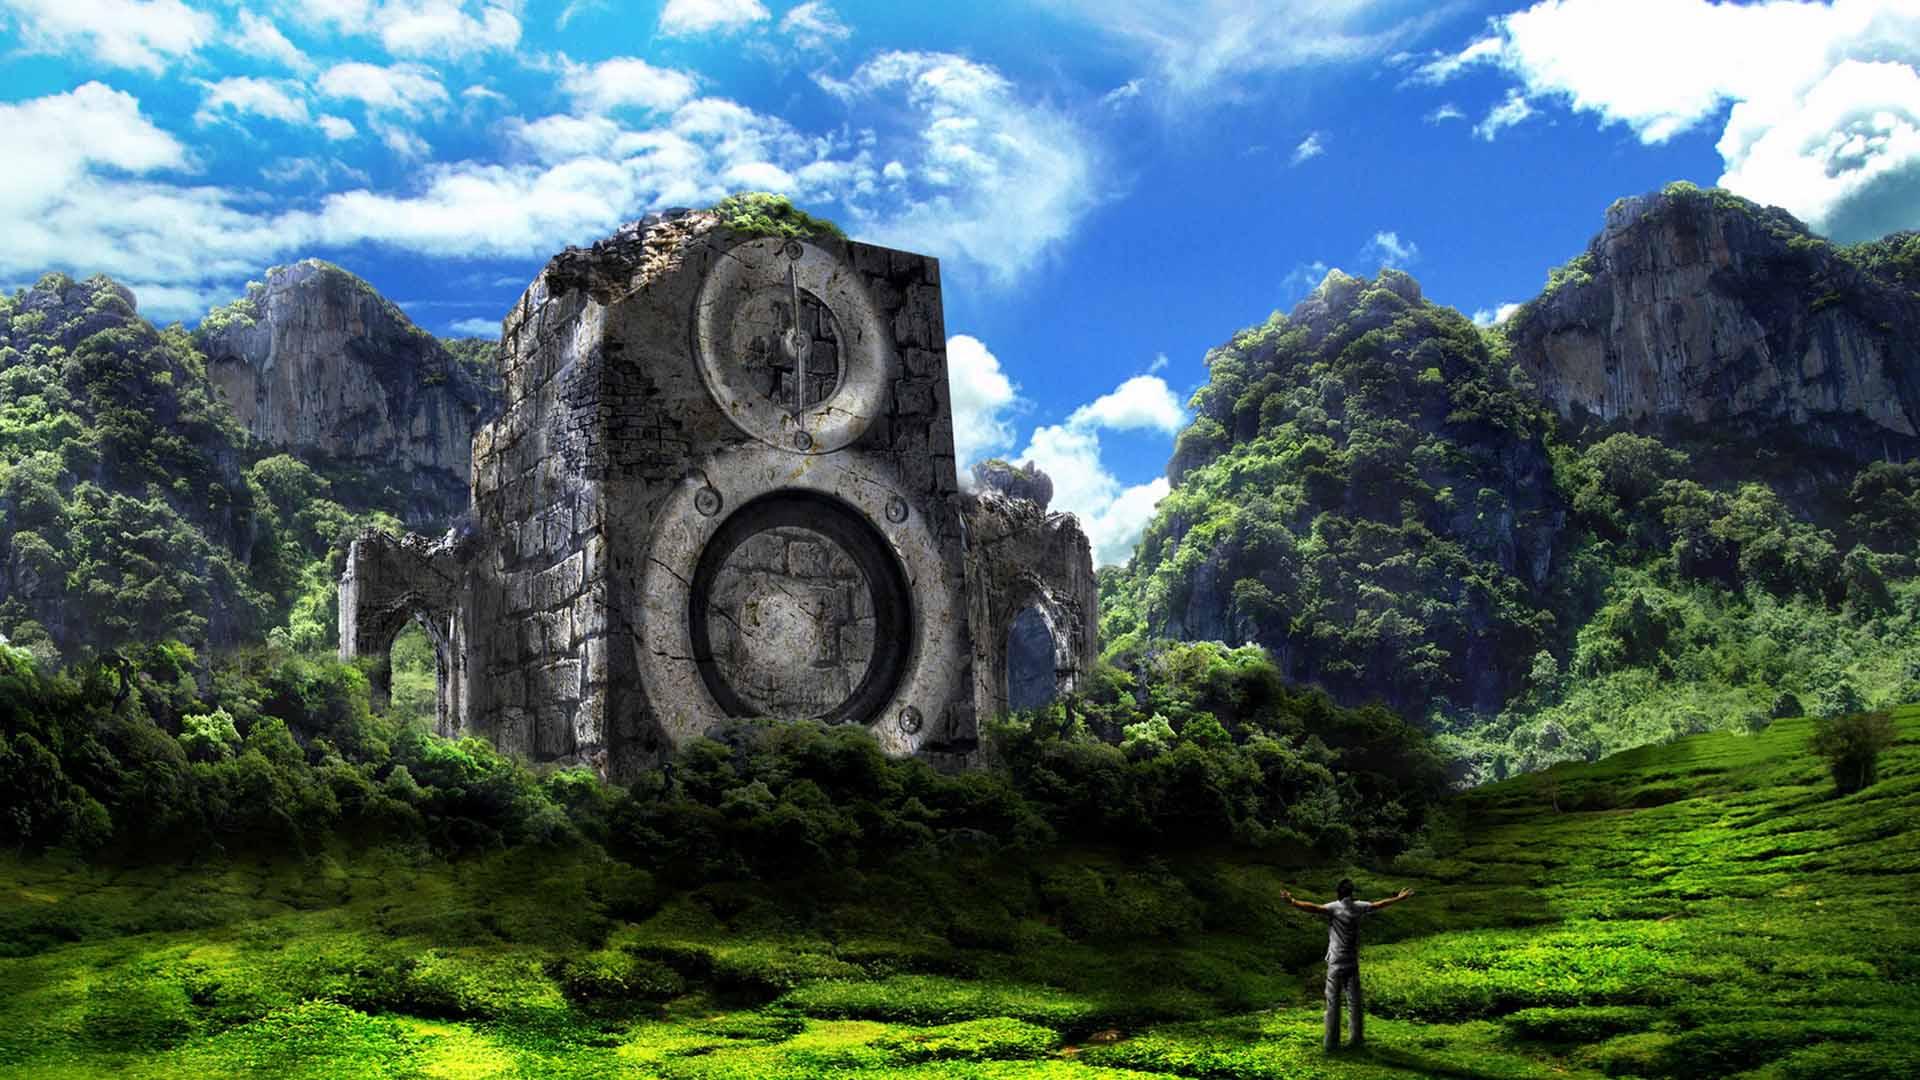 Kodi community forum delay on background images displaying - Kodi wallpaper ...